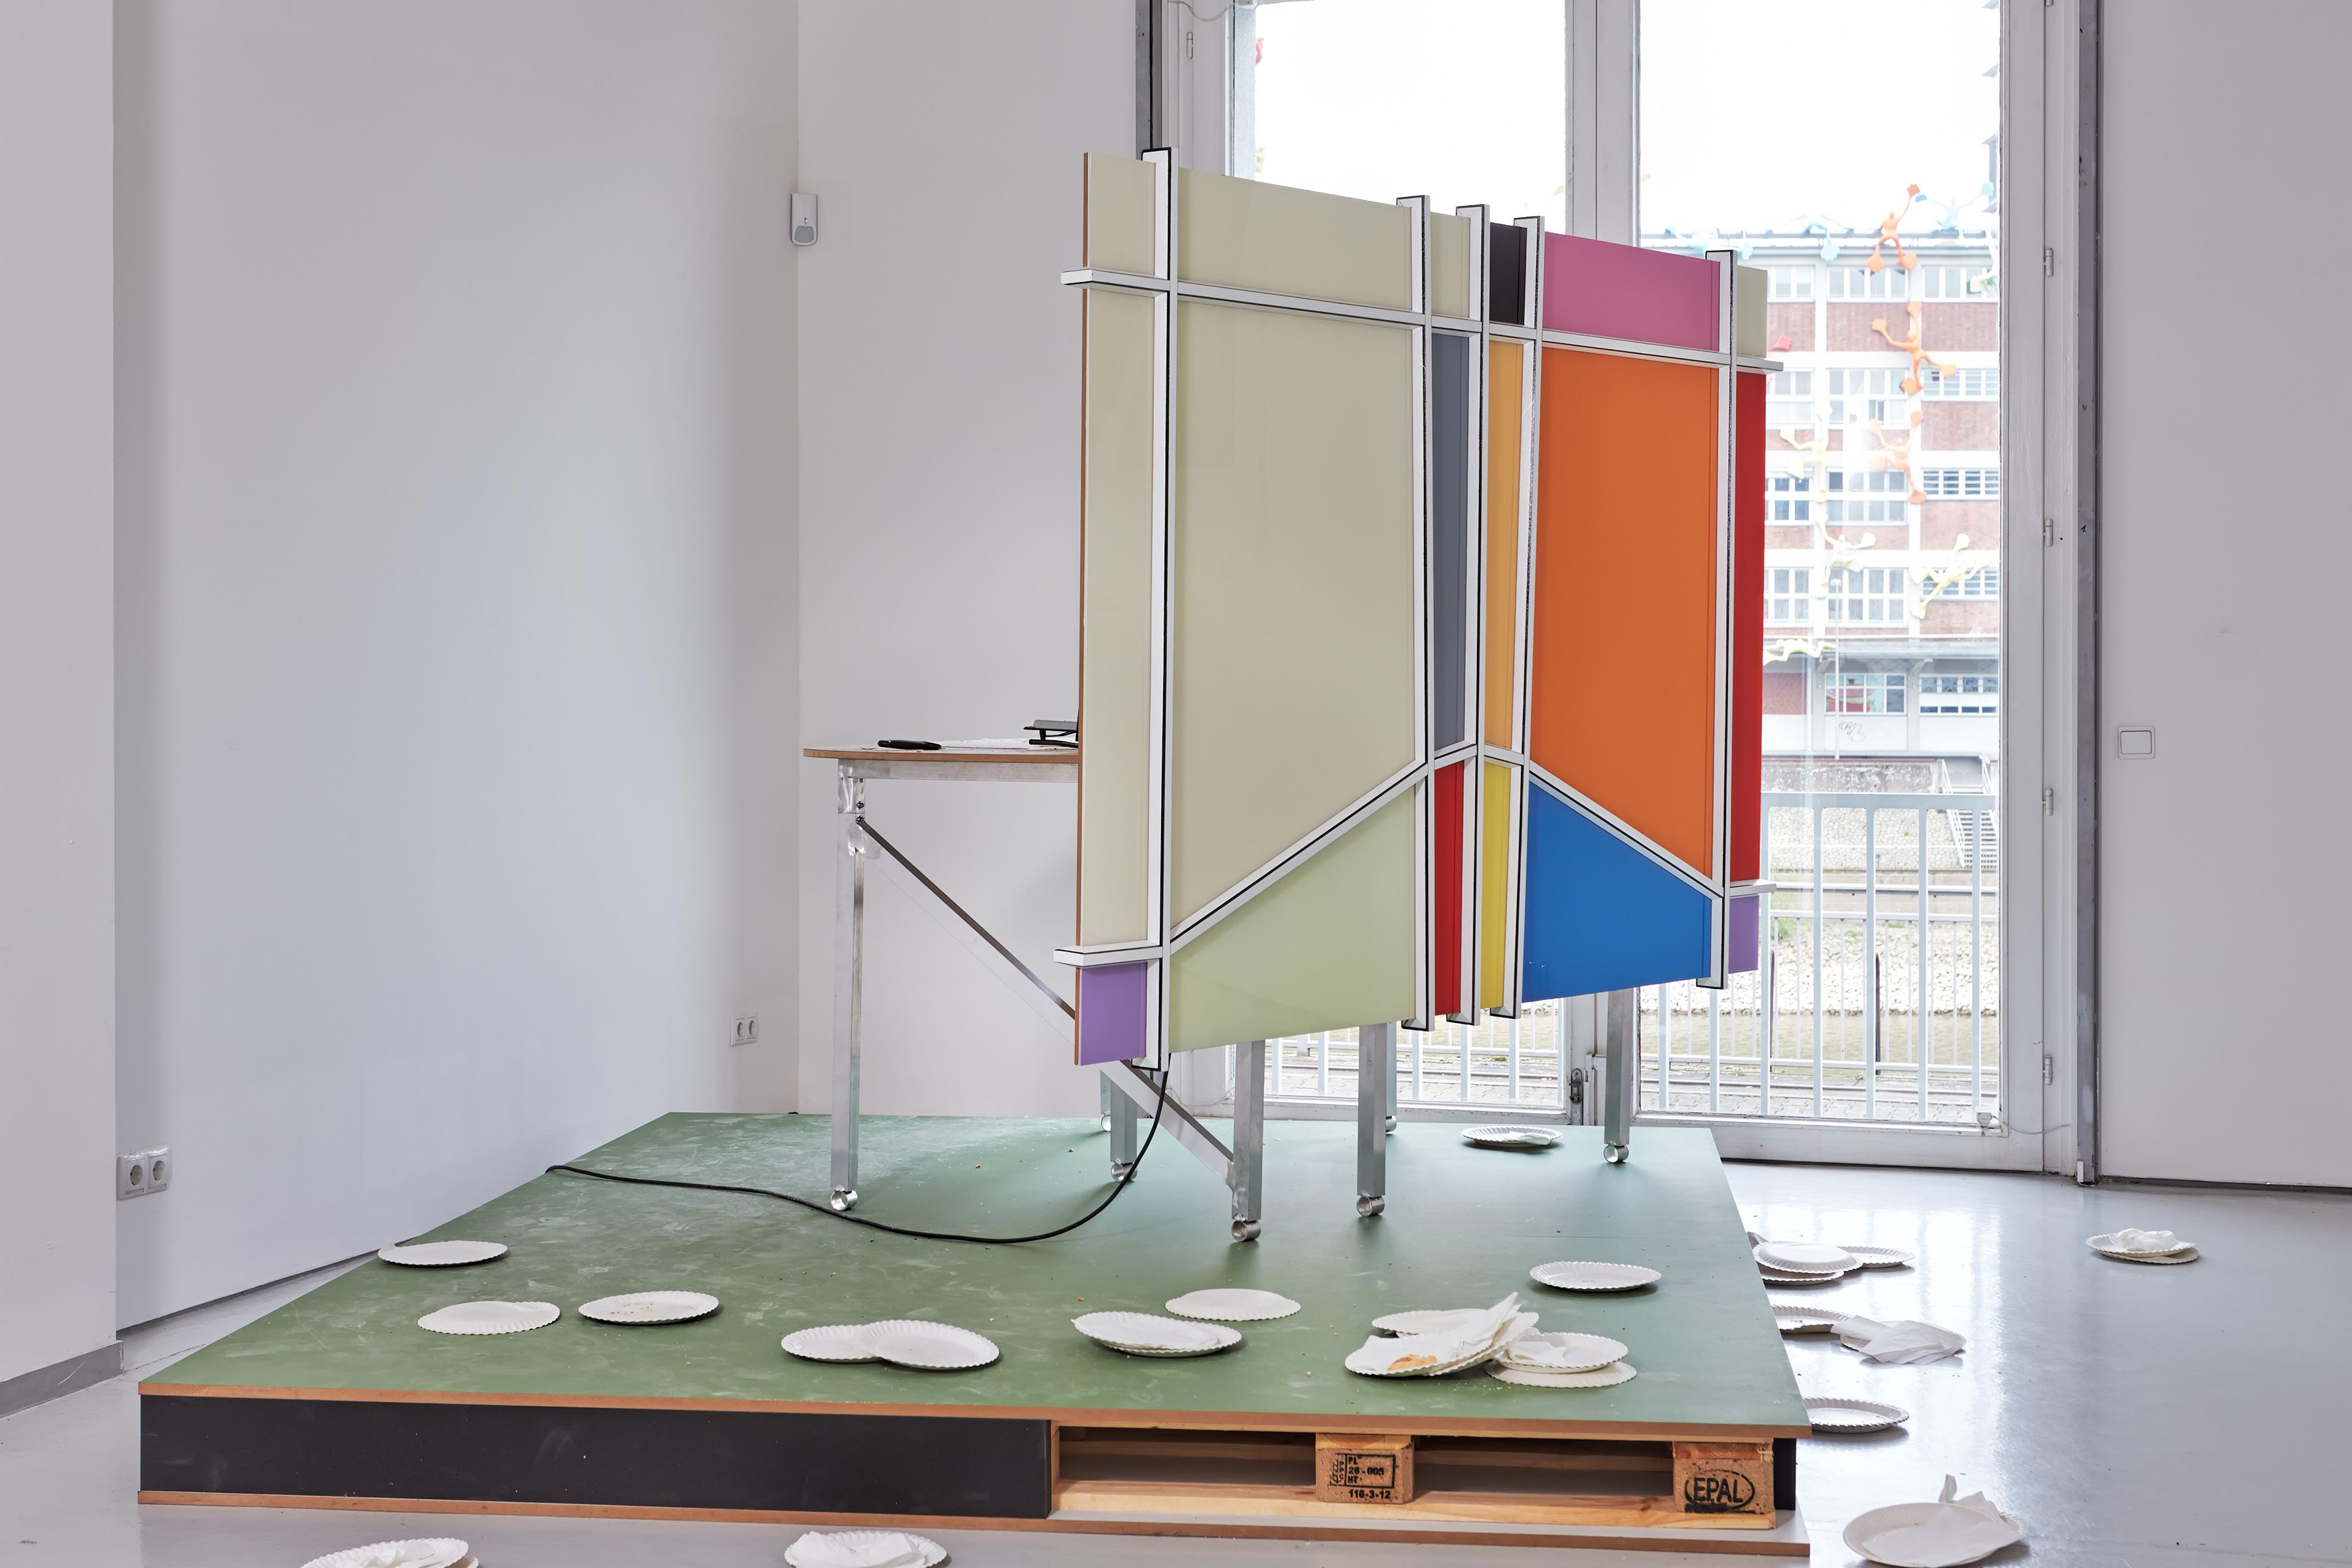 Galerie Barbara Thumm \ Anna K.E. – Backdoor Fantasies